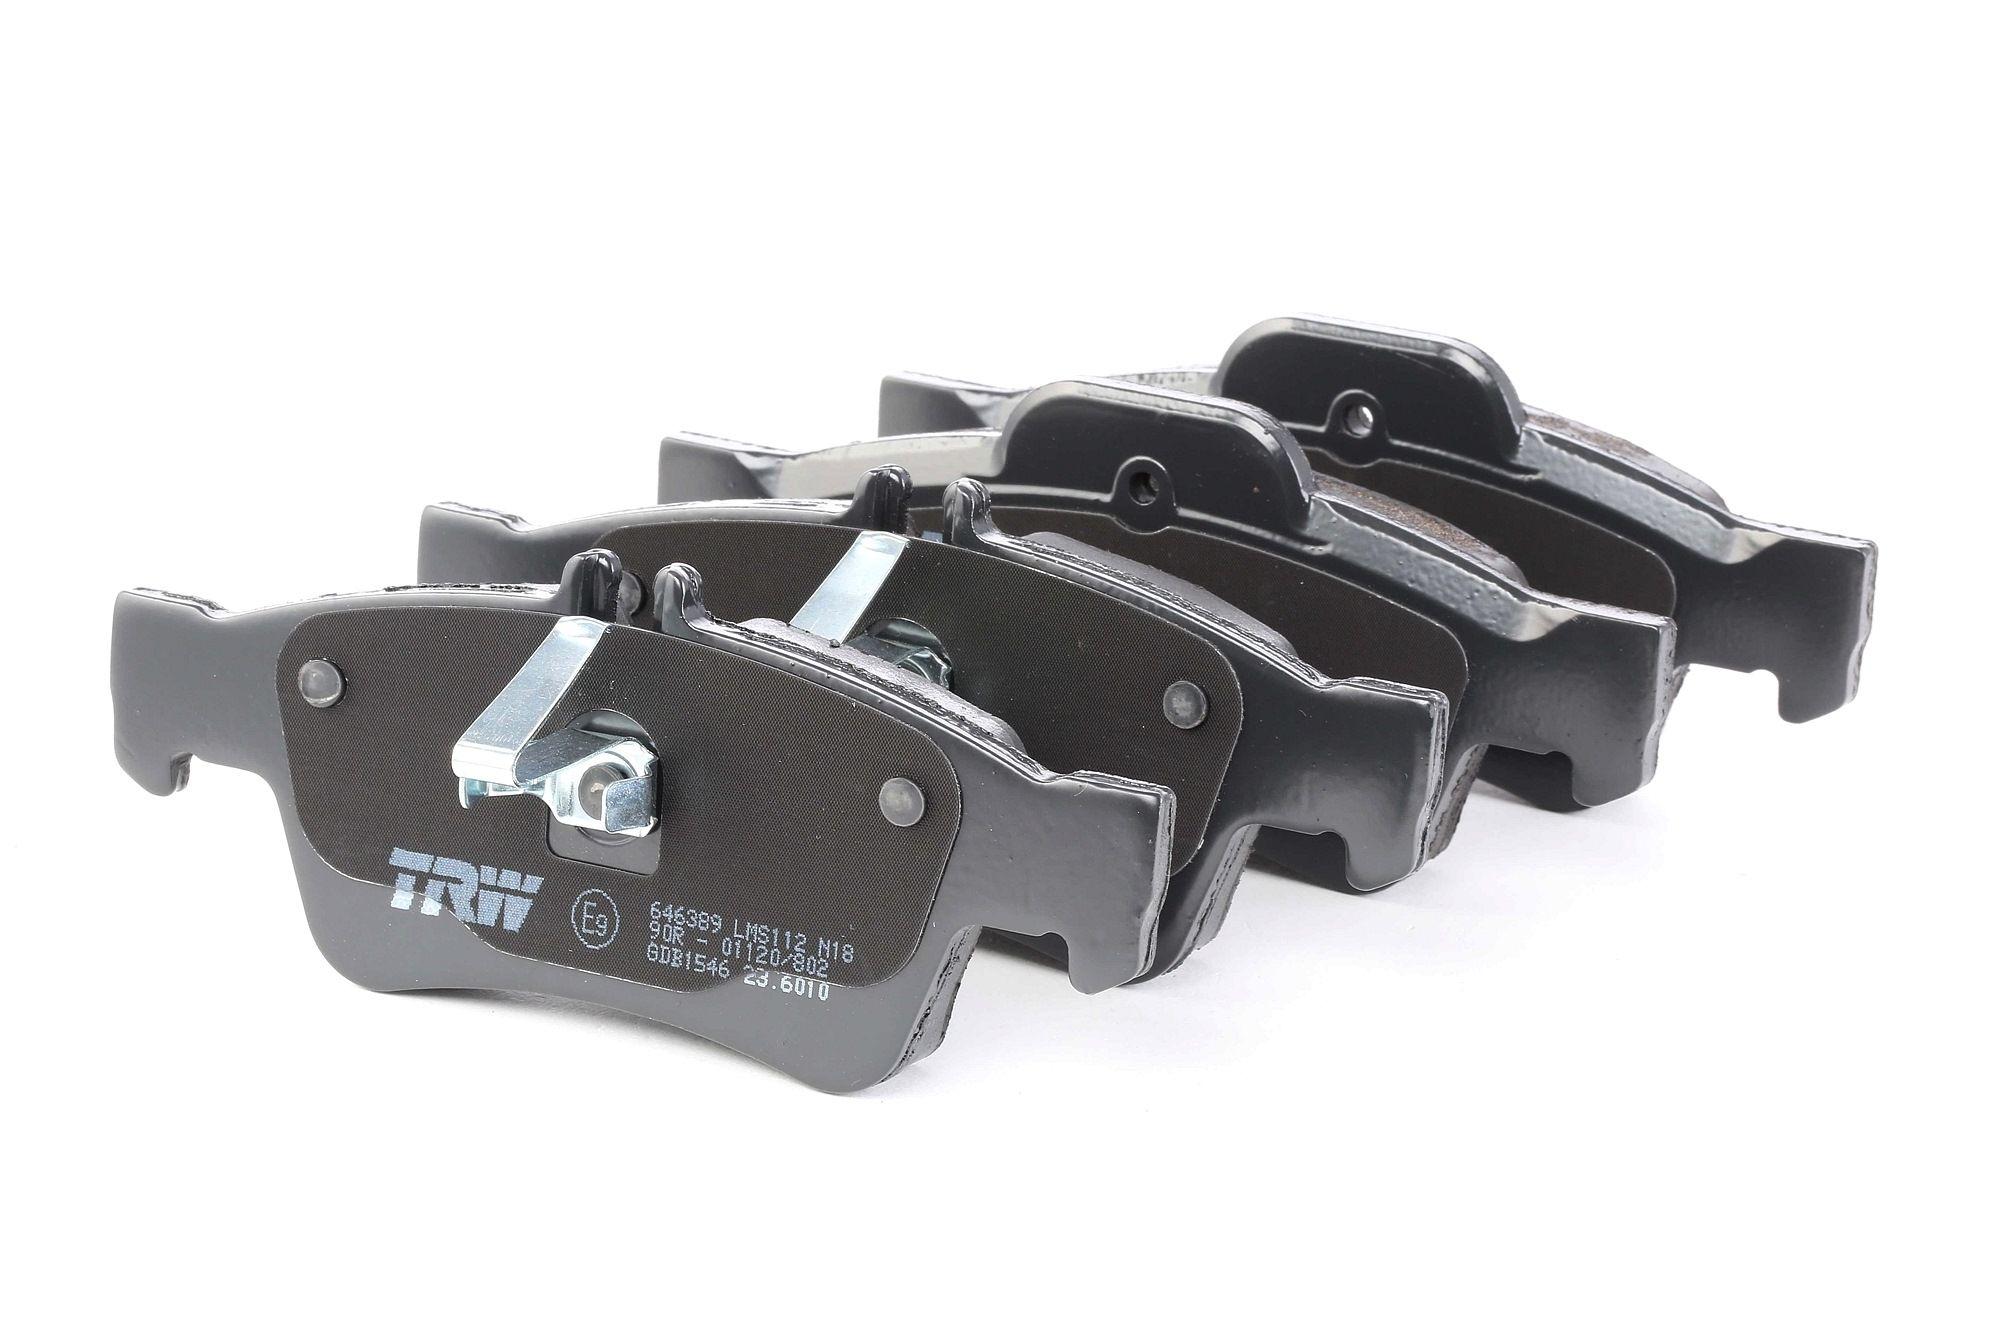 MERCEDES-BENZ SL 2014 Bremsbelagsatz - Original TRW GDB1546 Höhe 1: 59,7mm, Höhe 2: 57,4mm, Dicke/Stärke: 16,5mm